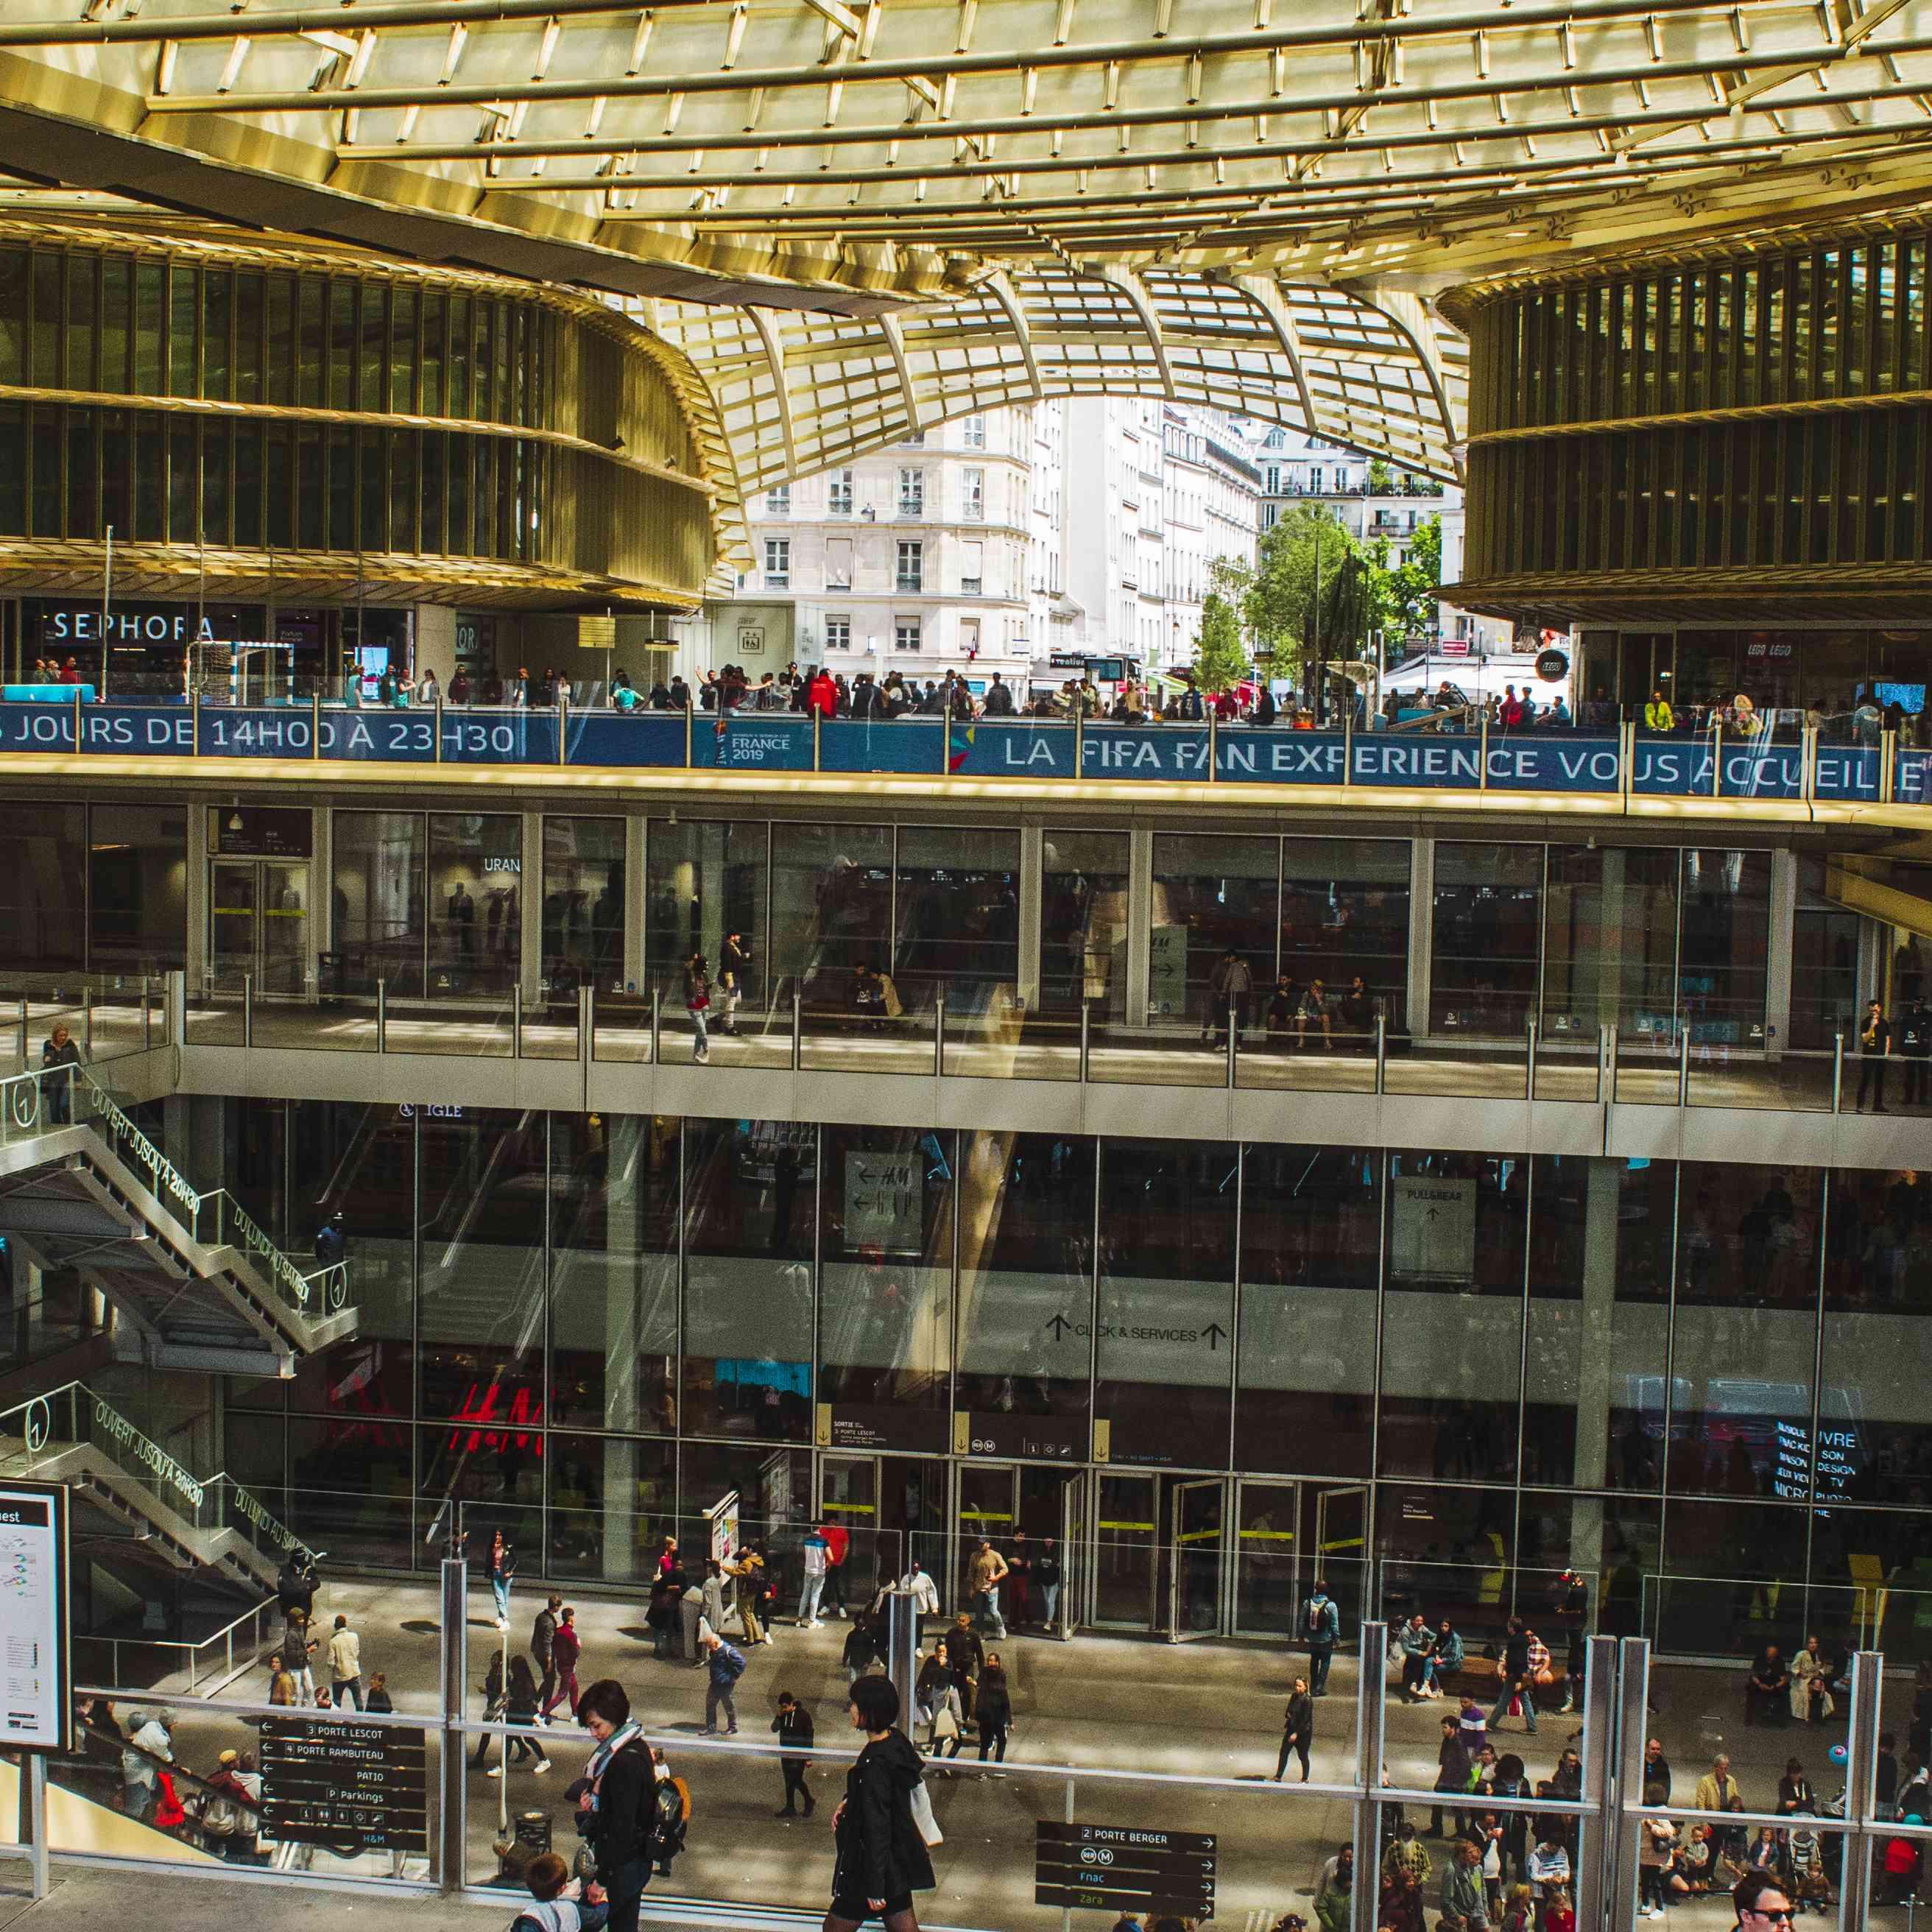 forum des halles shopping center in paris